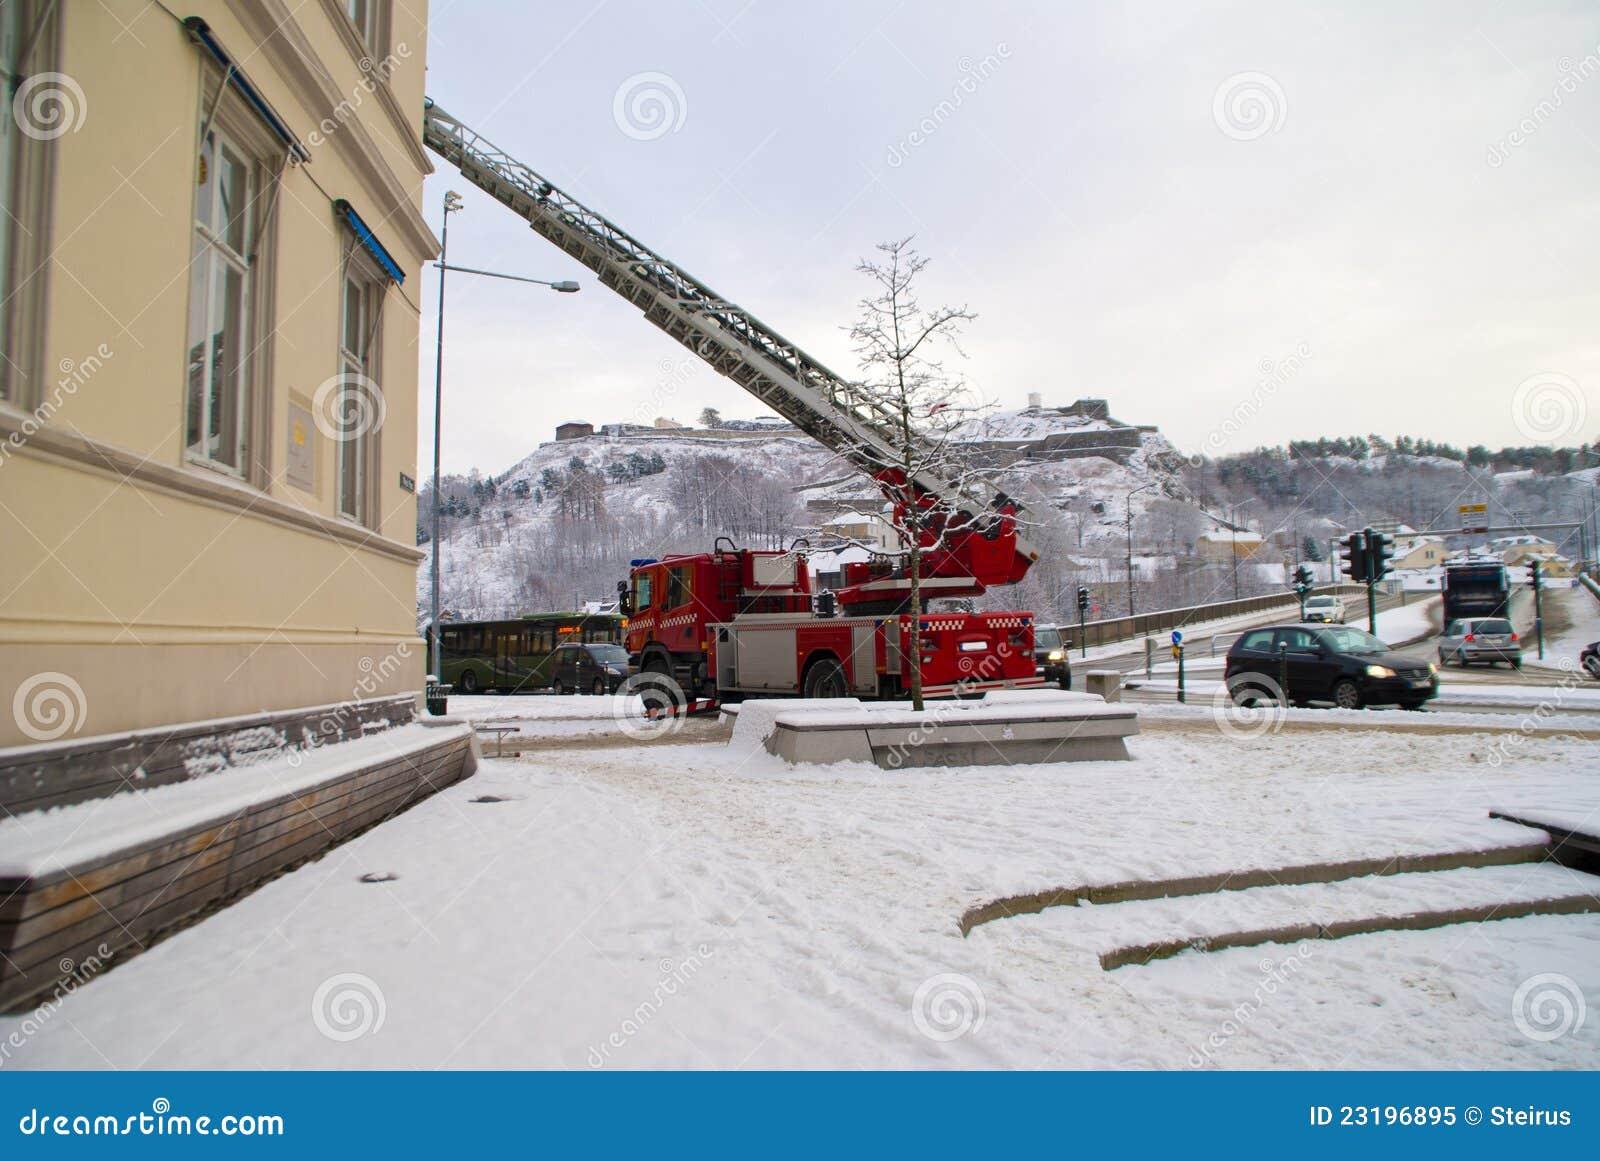 Fire trucks on a mission